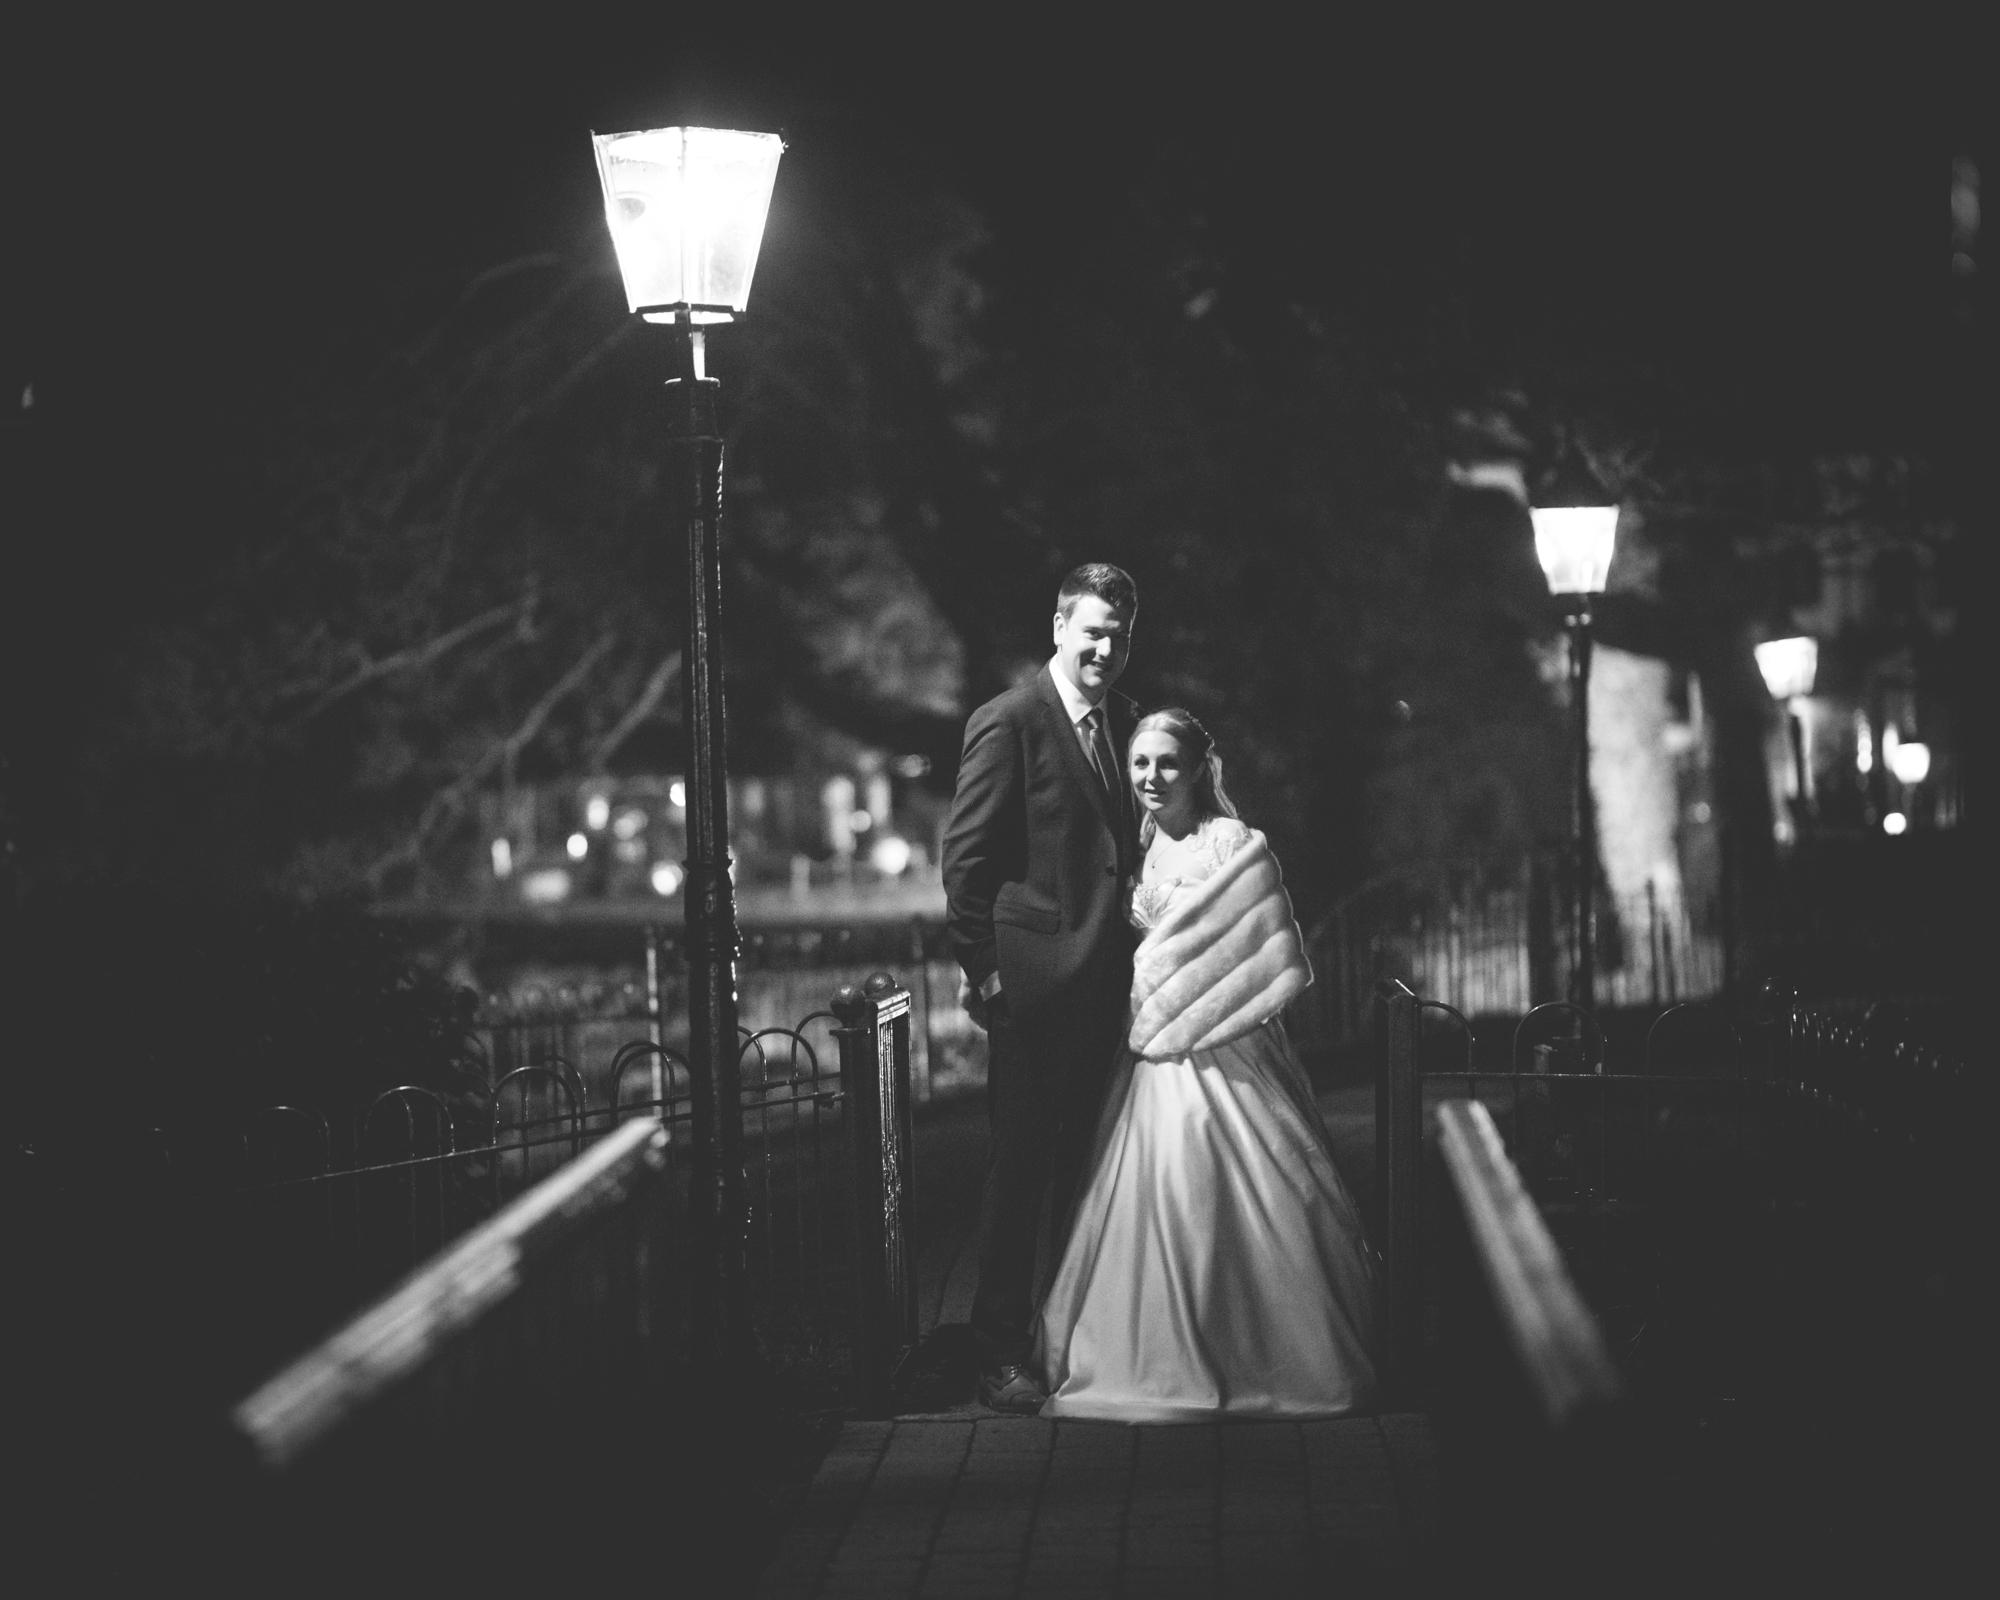 Steve_Emma_Portraits-107.jpg